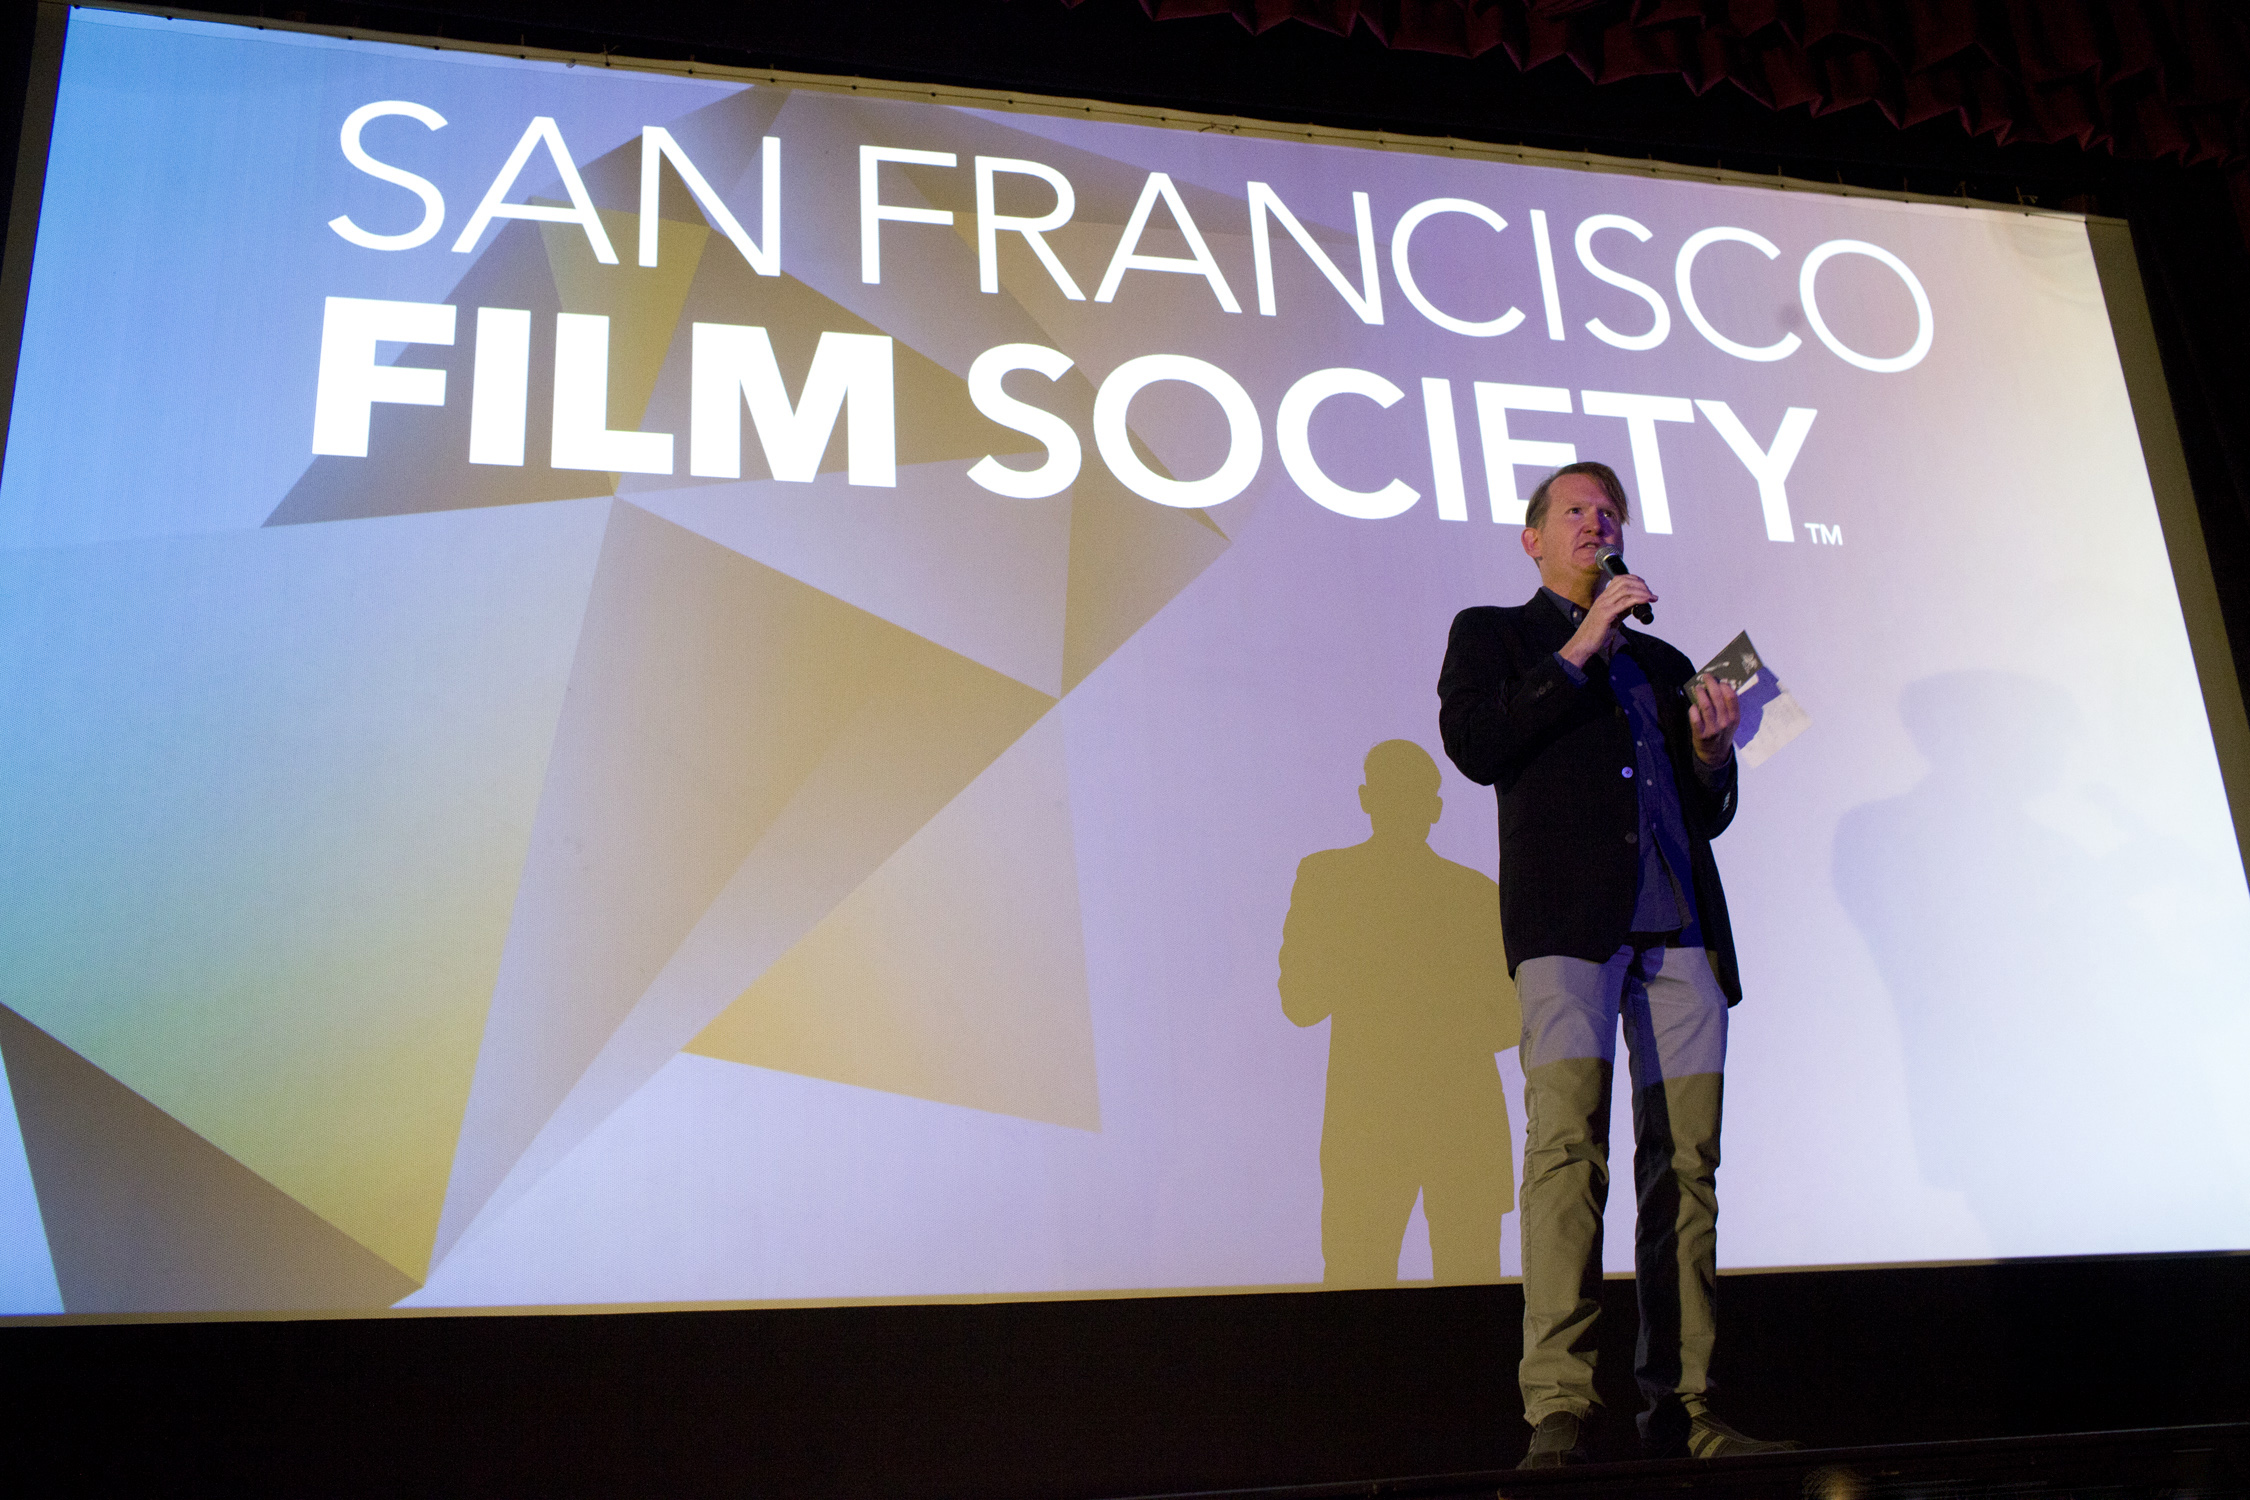 San Francisco Film Society Programmer Rod Armstrong